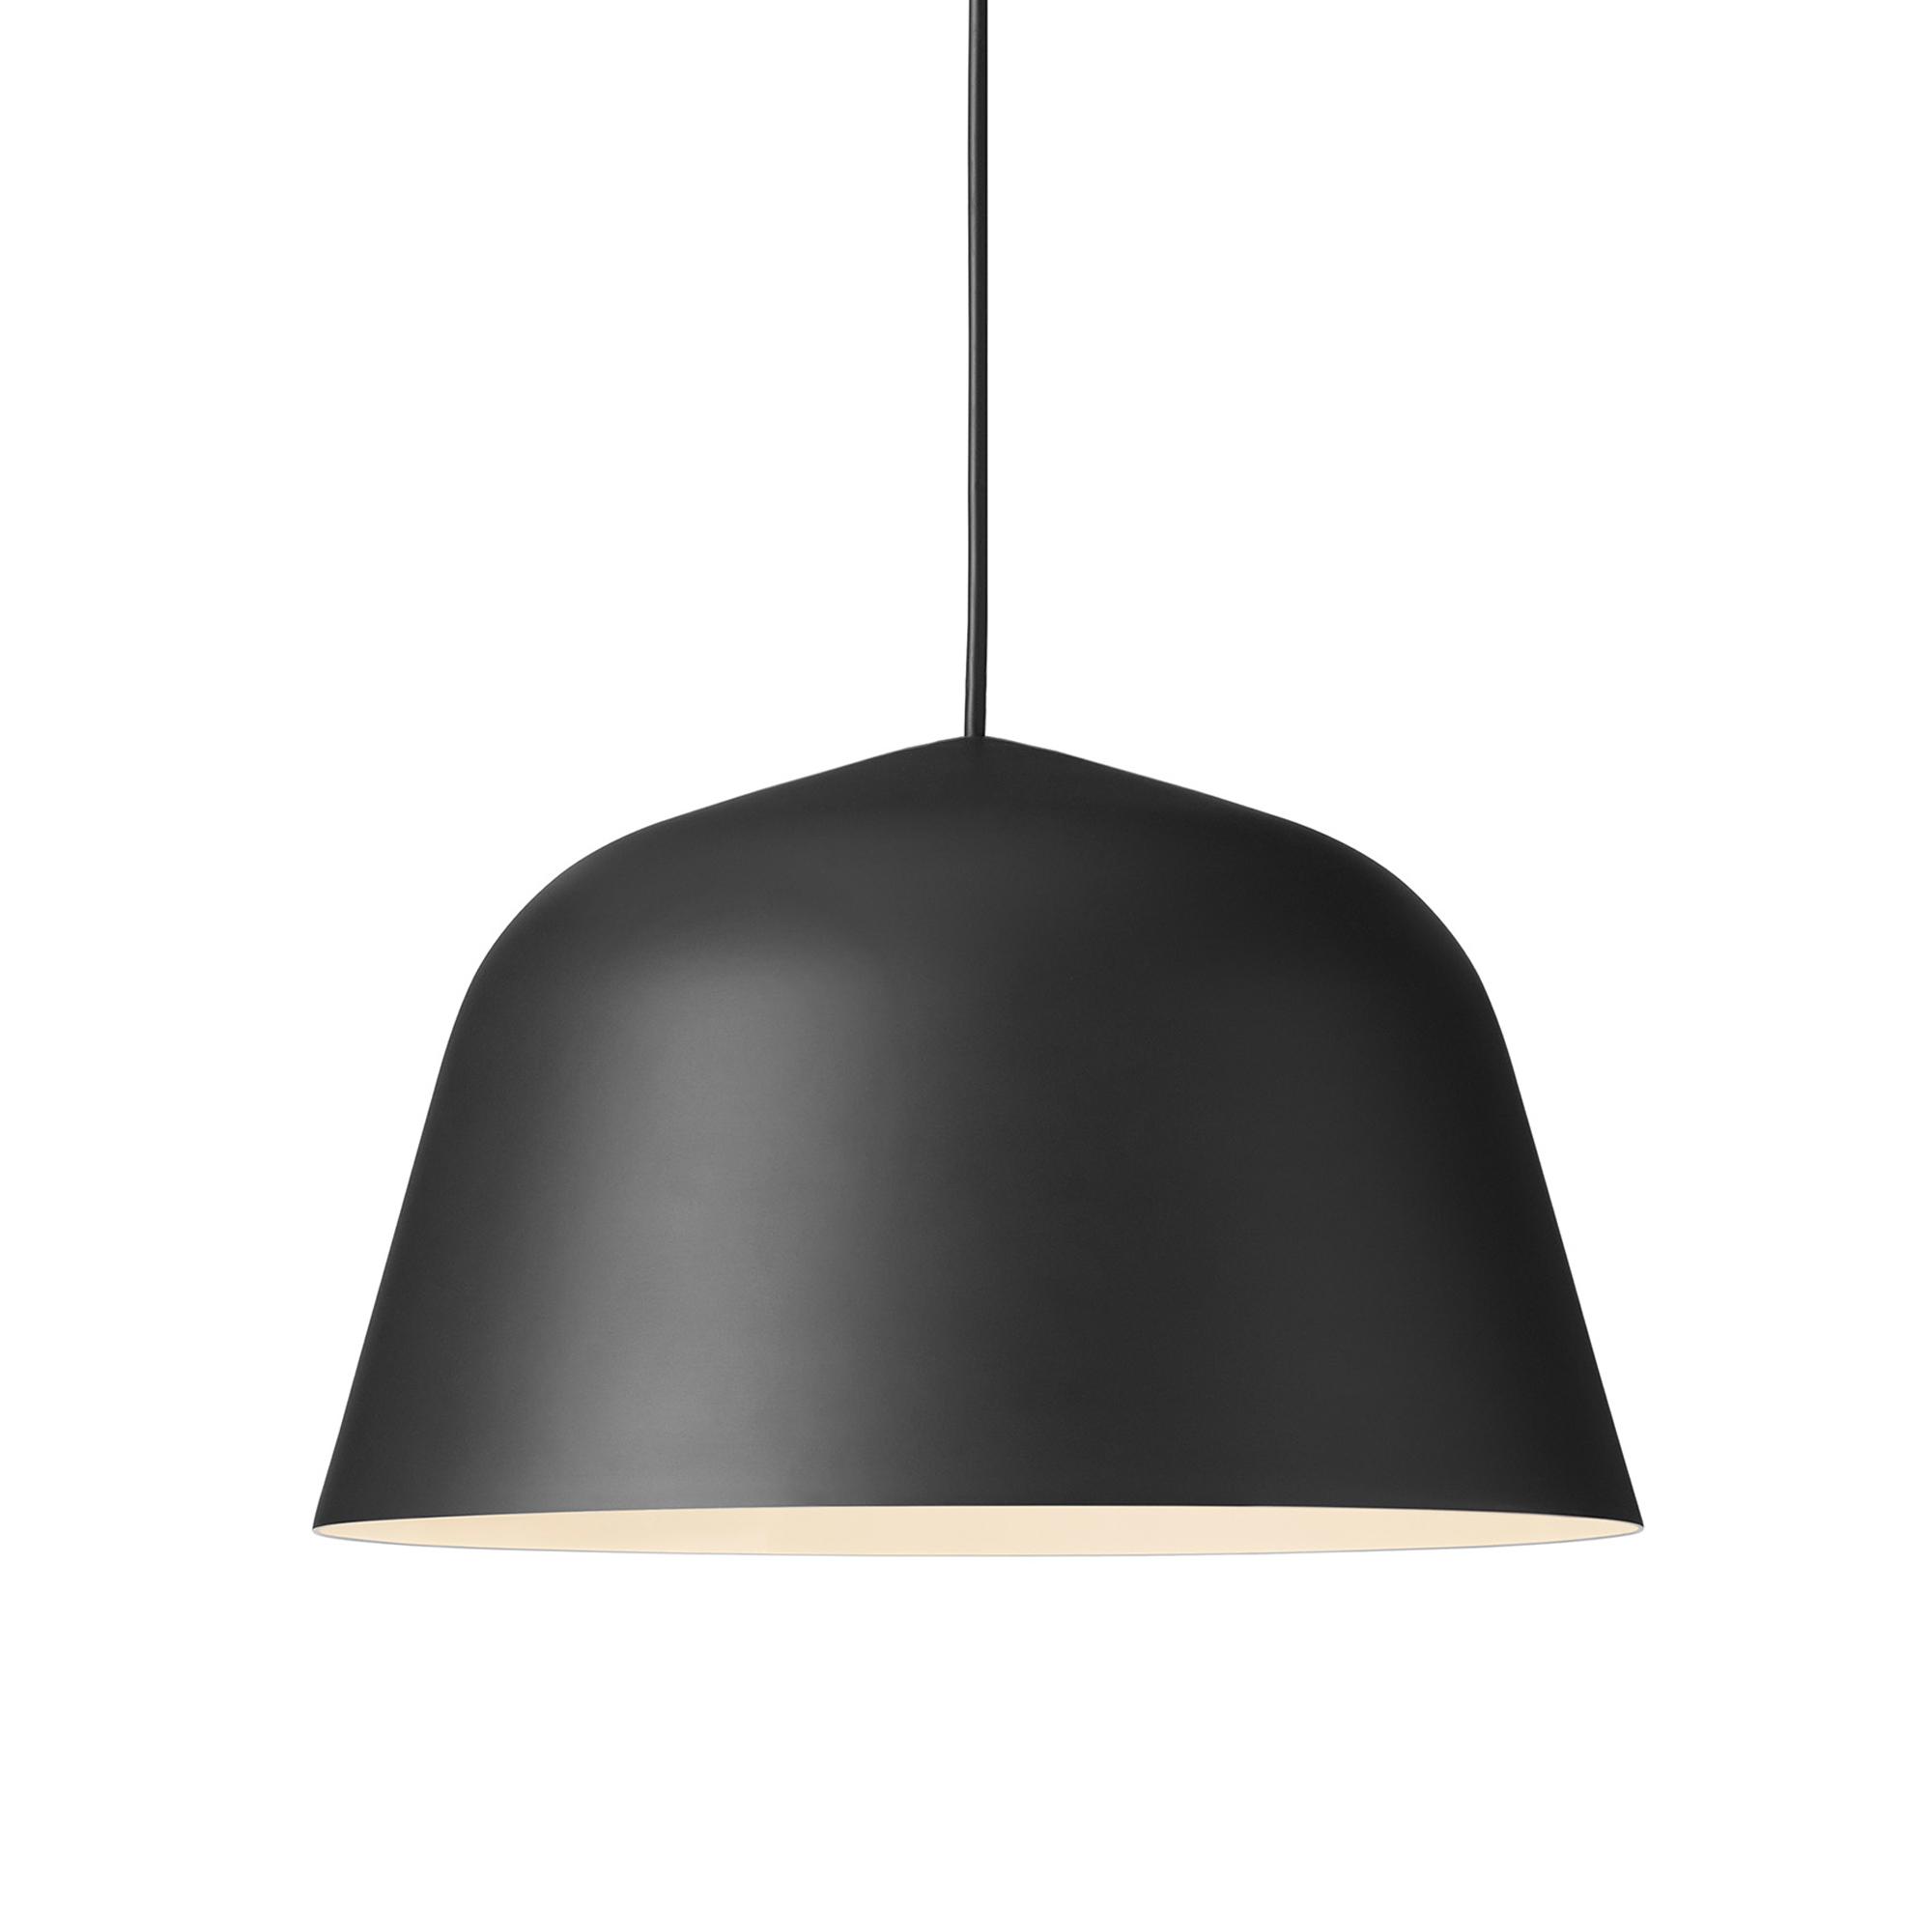 Muuto Lampa Ambit 40 svart